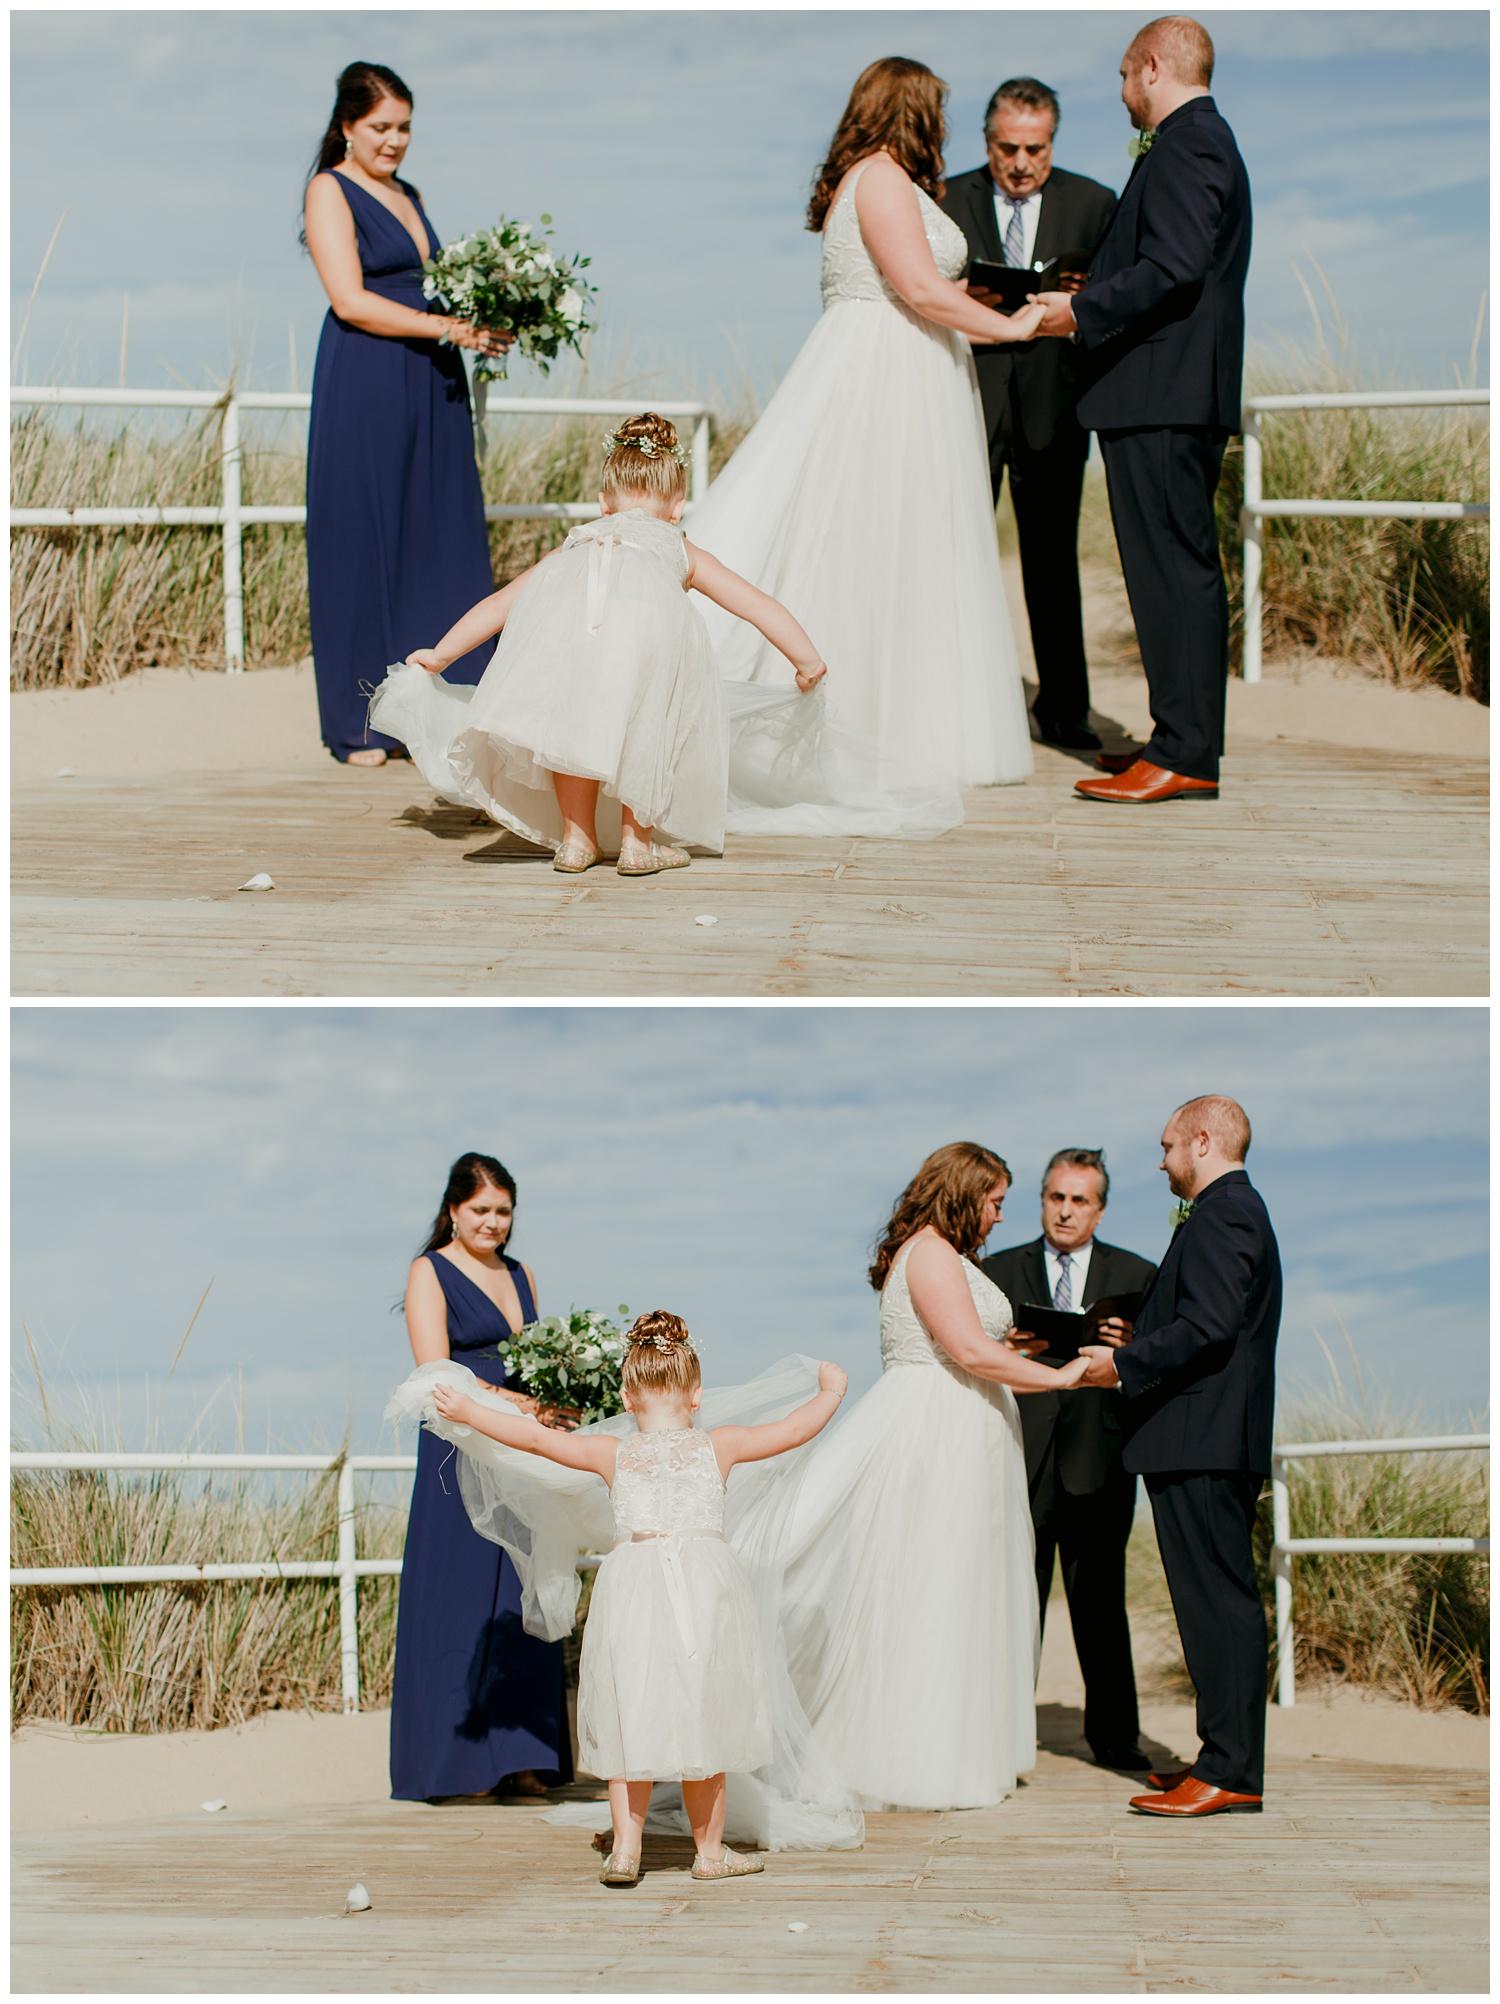 jeanklockweddingbentonharbormichiganphotojournaliststyledestinationwedding13.jpg